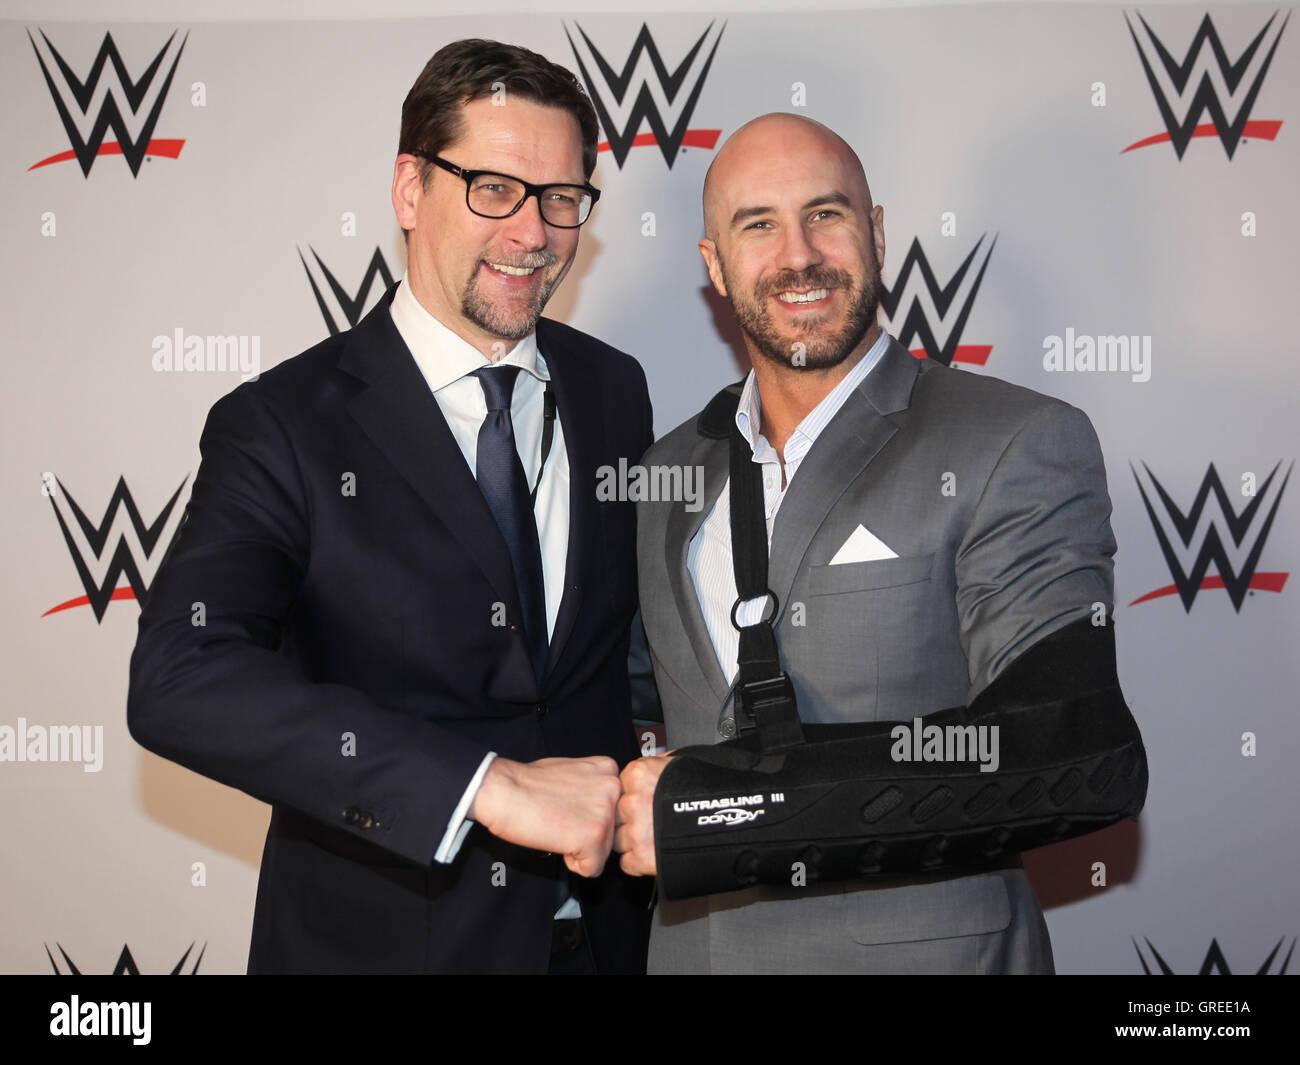 Wwe General Manager Europe Stefan Kastenmüller And Wwe Superstar Cesaro - Stock Image